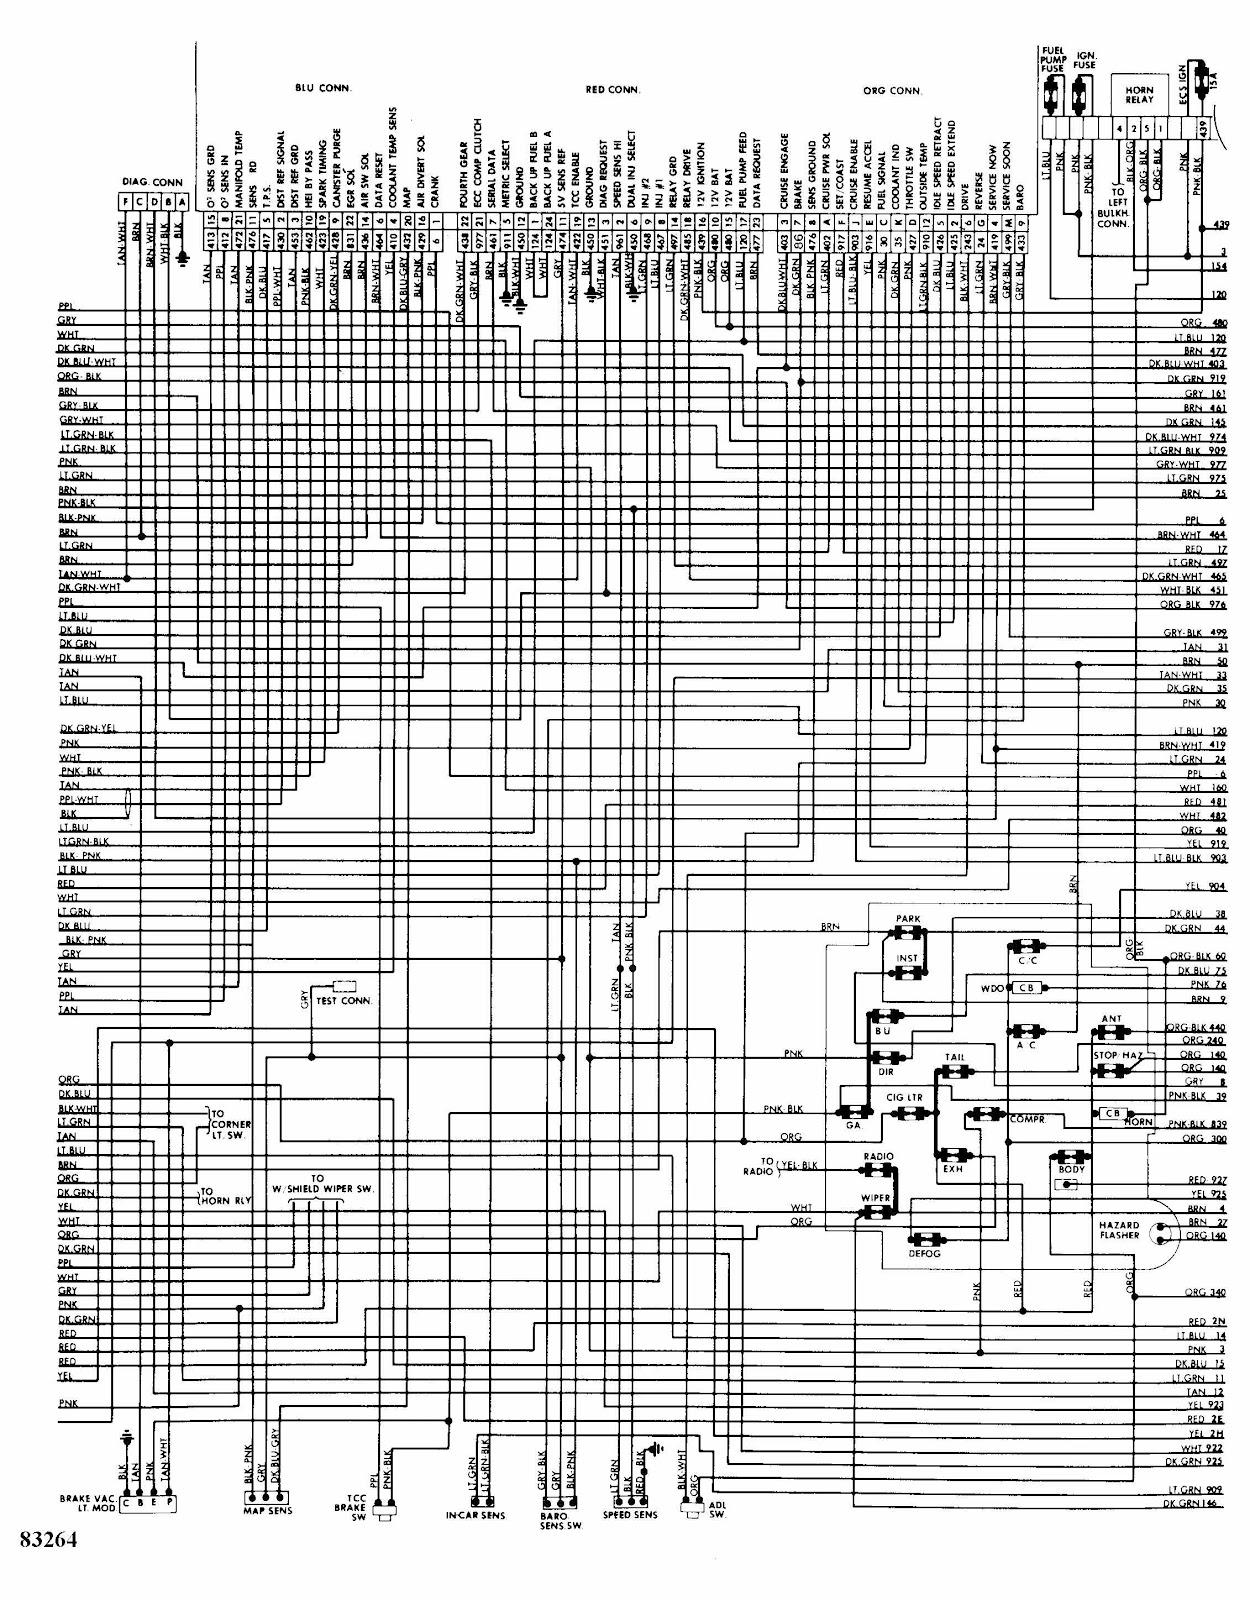 2000 mercury grand marquis wiring diagrams, 2000 lincoln ls wiring diagrams, 2005 cadillac cts wiring diagrams, 2000 dodge dakota wiring diagrams, 2002 jeep grand cherokee wiring diagrams, 2000 ford explorer wiring diagrams, 2000 honda accord wiring diagrams, 2000 chevrolet impala wiring diagrams, 2003 chevrolet trailblazer wiring diagrams, 2001 jeep grand cherokee wiring diagrams, 2007 cadillac escalade wiring diagrams, 2002 mercury mountaineer wiring diagrams, 2000 ford mustang wiring diagrams, 2005 chrysler pt cruiser wiring diagrams, 2000 toyota 4runner wiring diagrams, 2001 buick lesabre wiring diagrams, 2000 fleetwood bounder wiring diagrams, 2000 toyota tundra wiring diagrams, 2000 jaguar s-type wiring diagrams, 2000 jeep wrangler wiring diagrams, on 2000 cadillac deville wiring diagrams